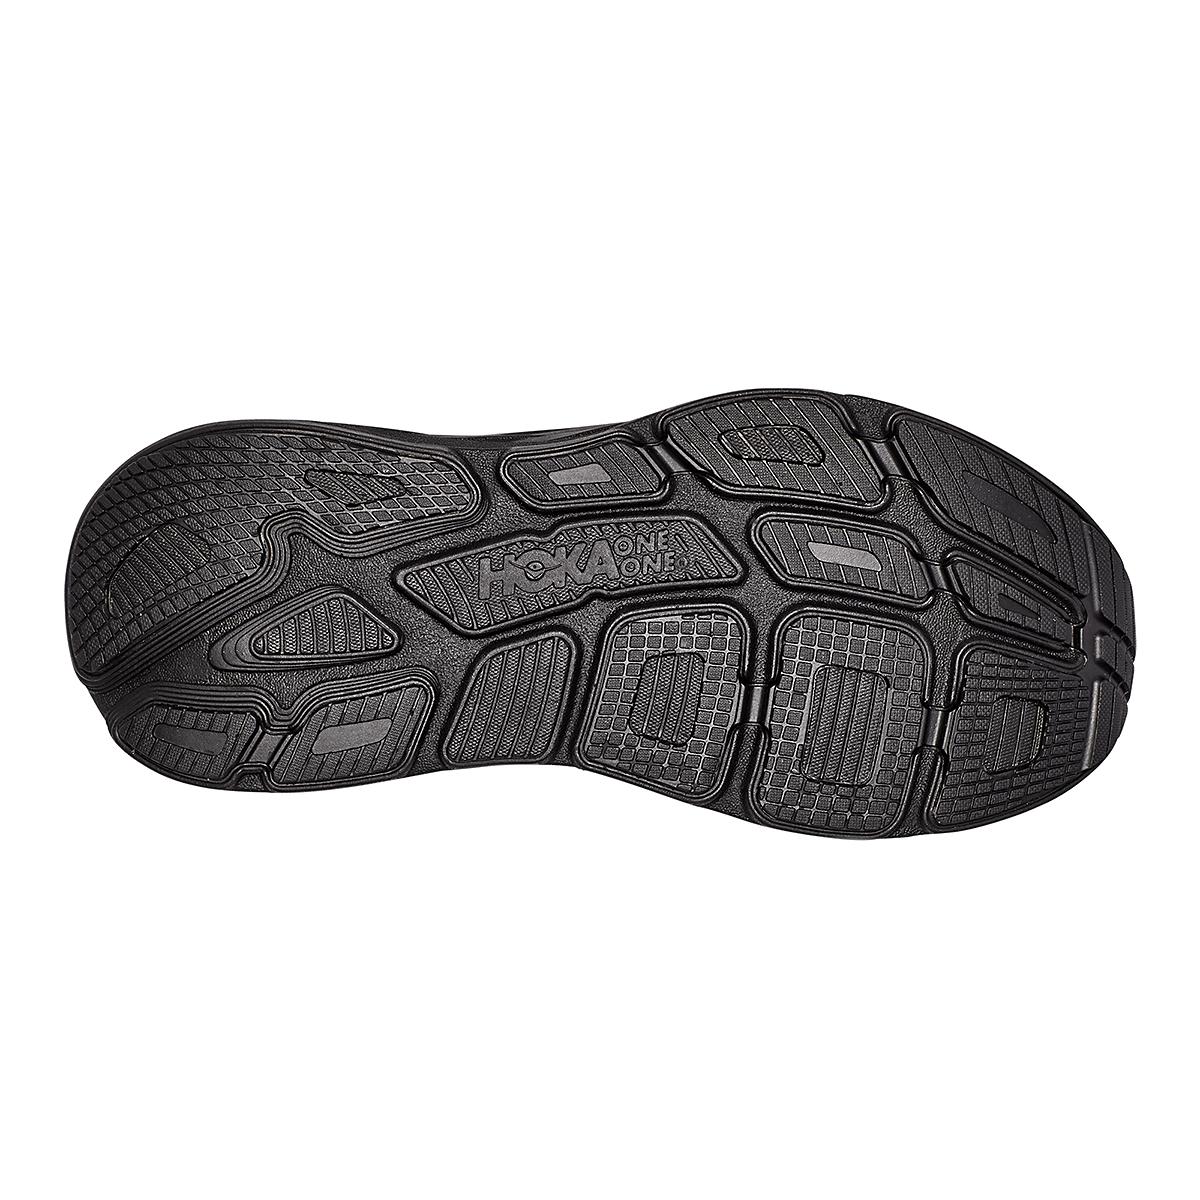 Men's Hoka One One Bondi 7 Running Shoe - Color: Black - Size: 7.5 - Width: Regular, Black, large, image 6